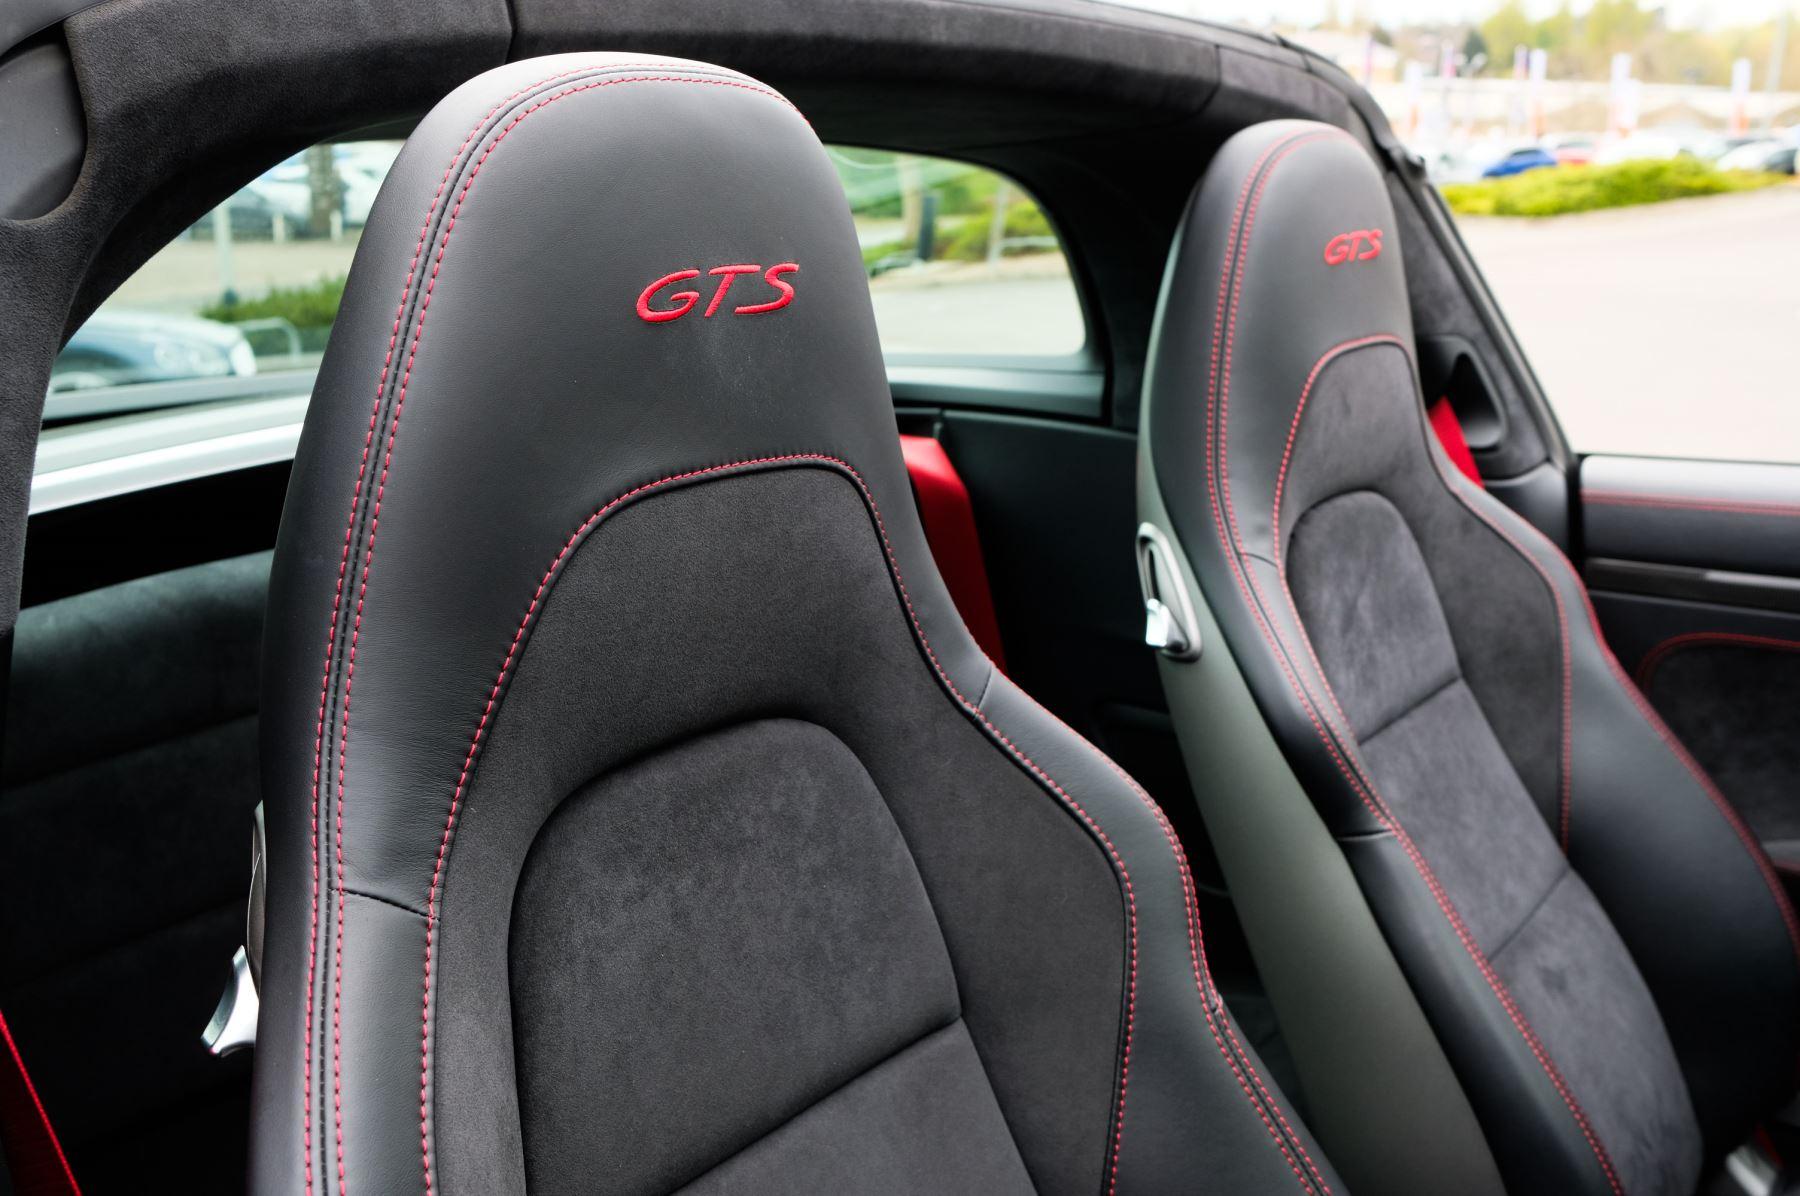 Porsche 911 TARGA 4 GTS - PDK - SPORT DESIGN PACKAGE - GTS INTERIOR PACKAGE image 14